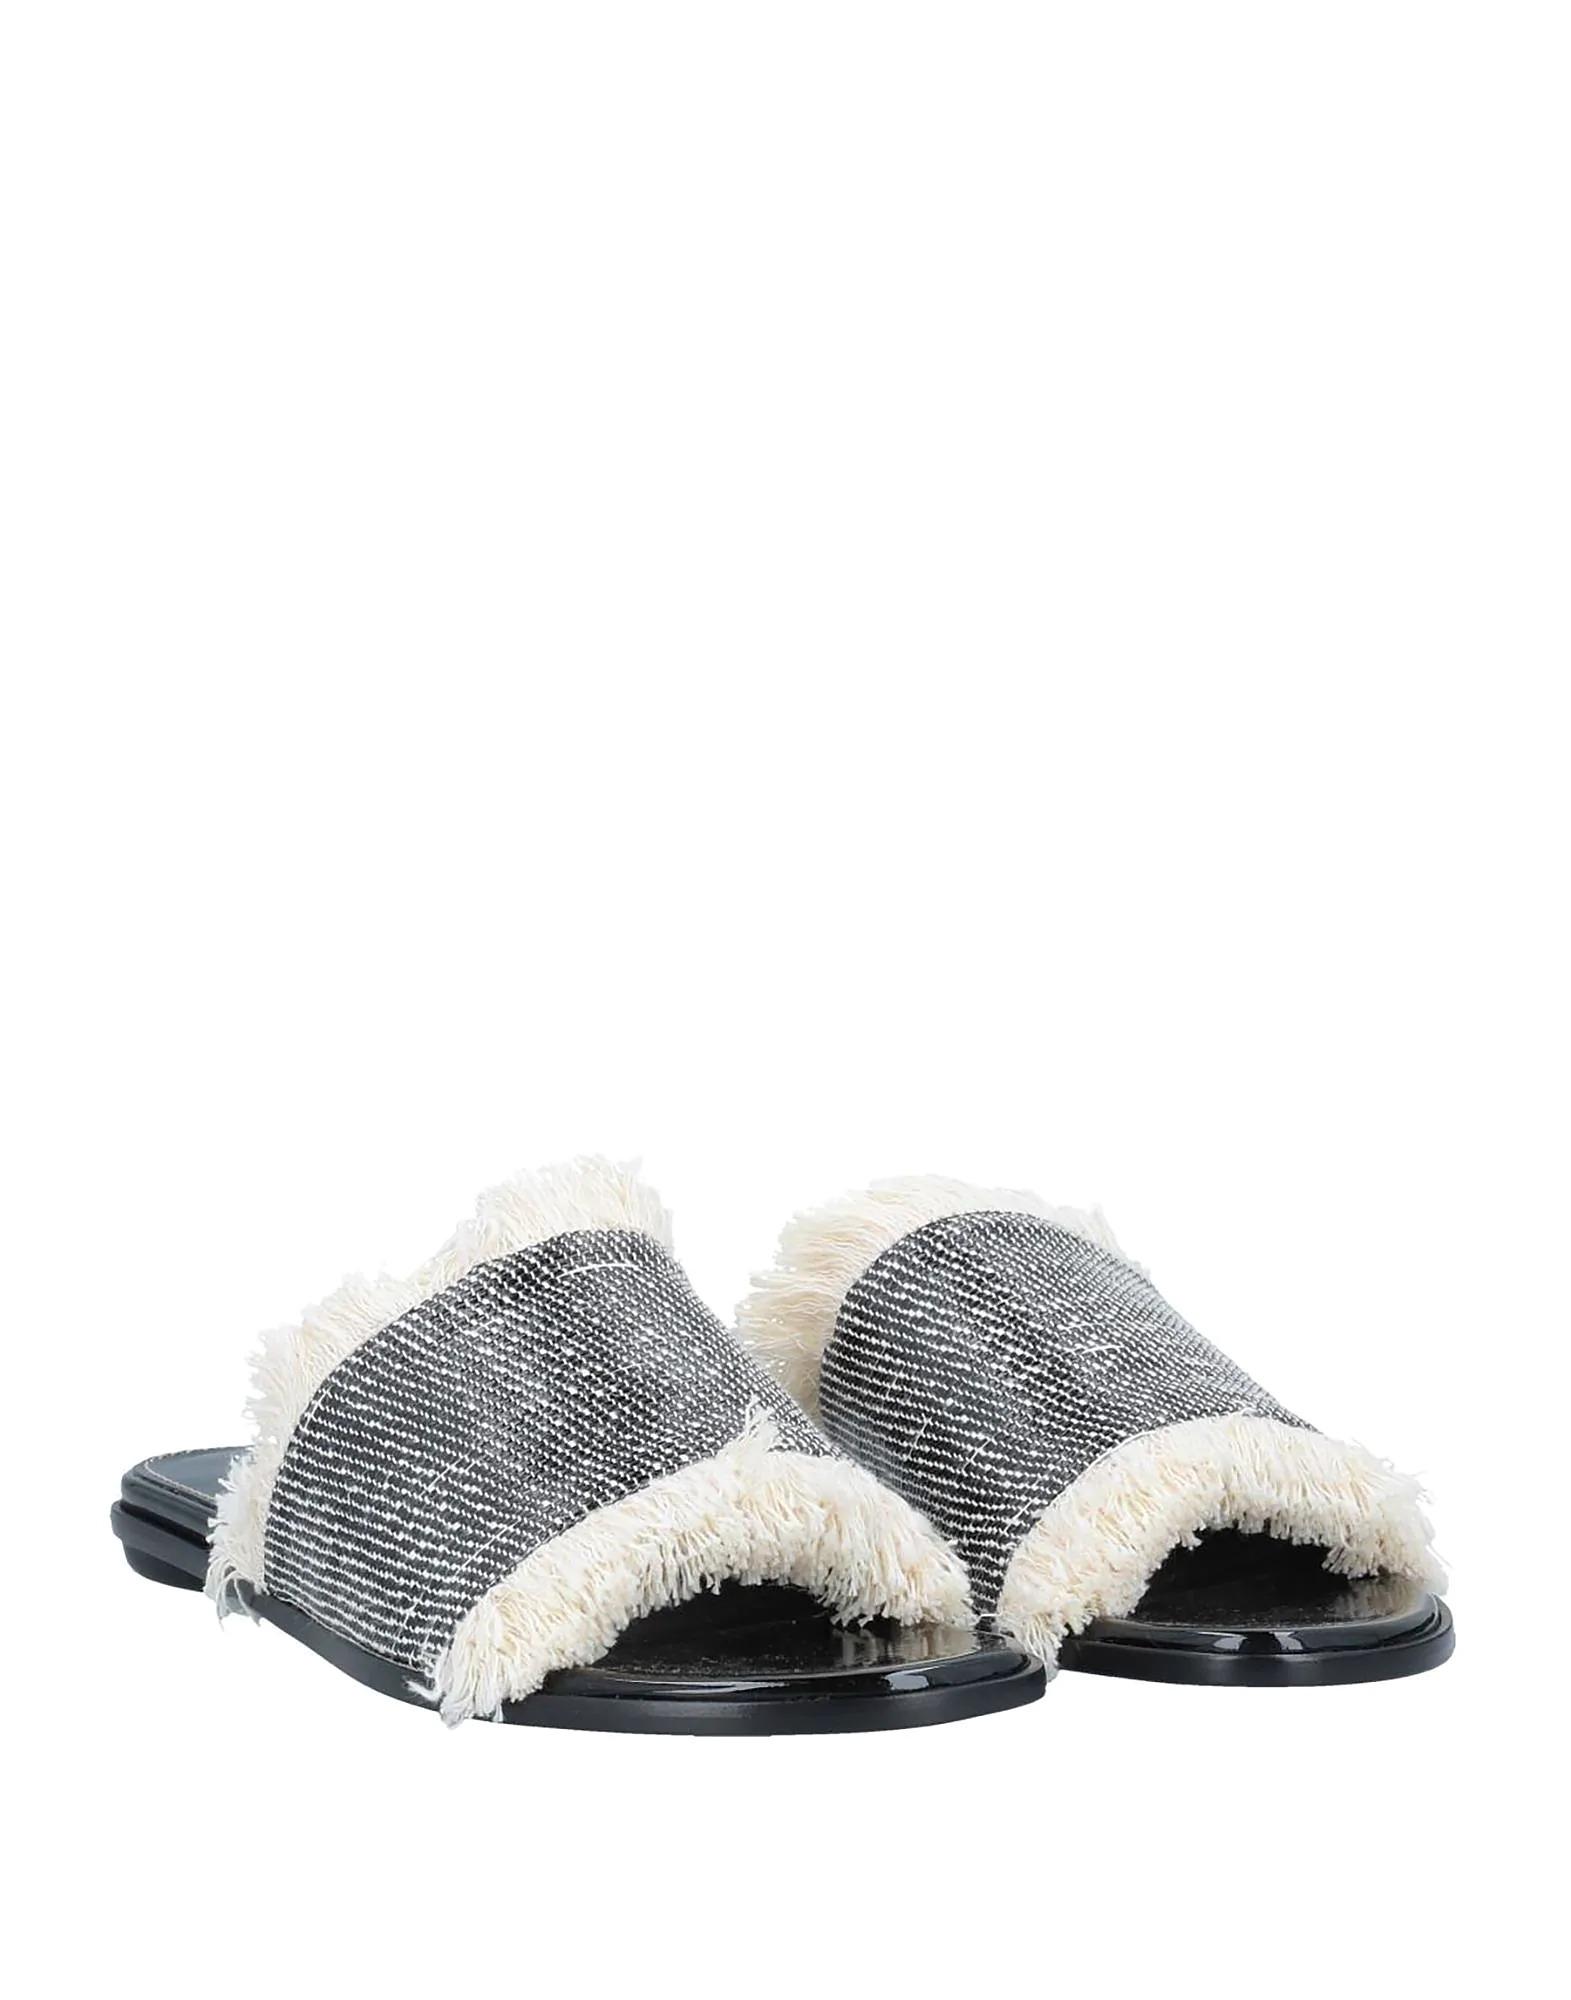 Sandalias de tela de Proenza Schouler.